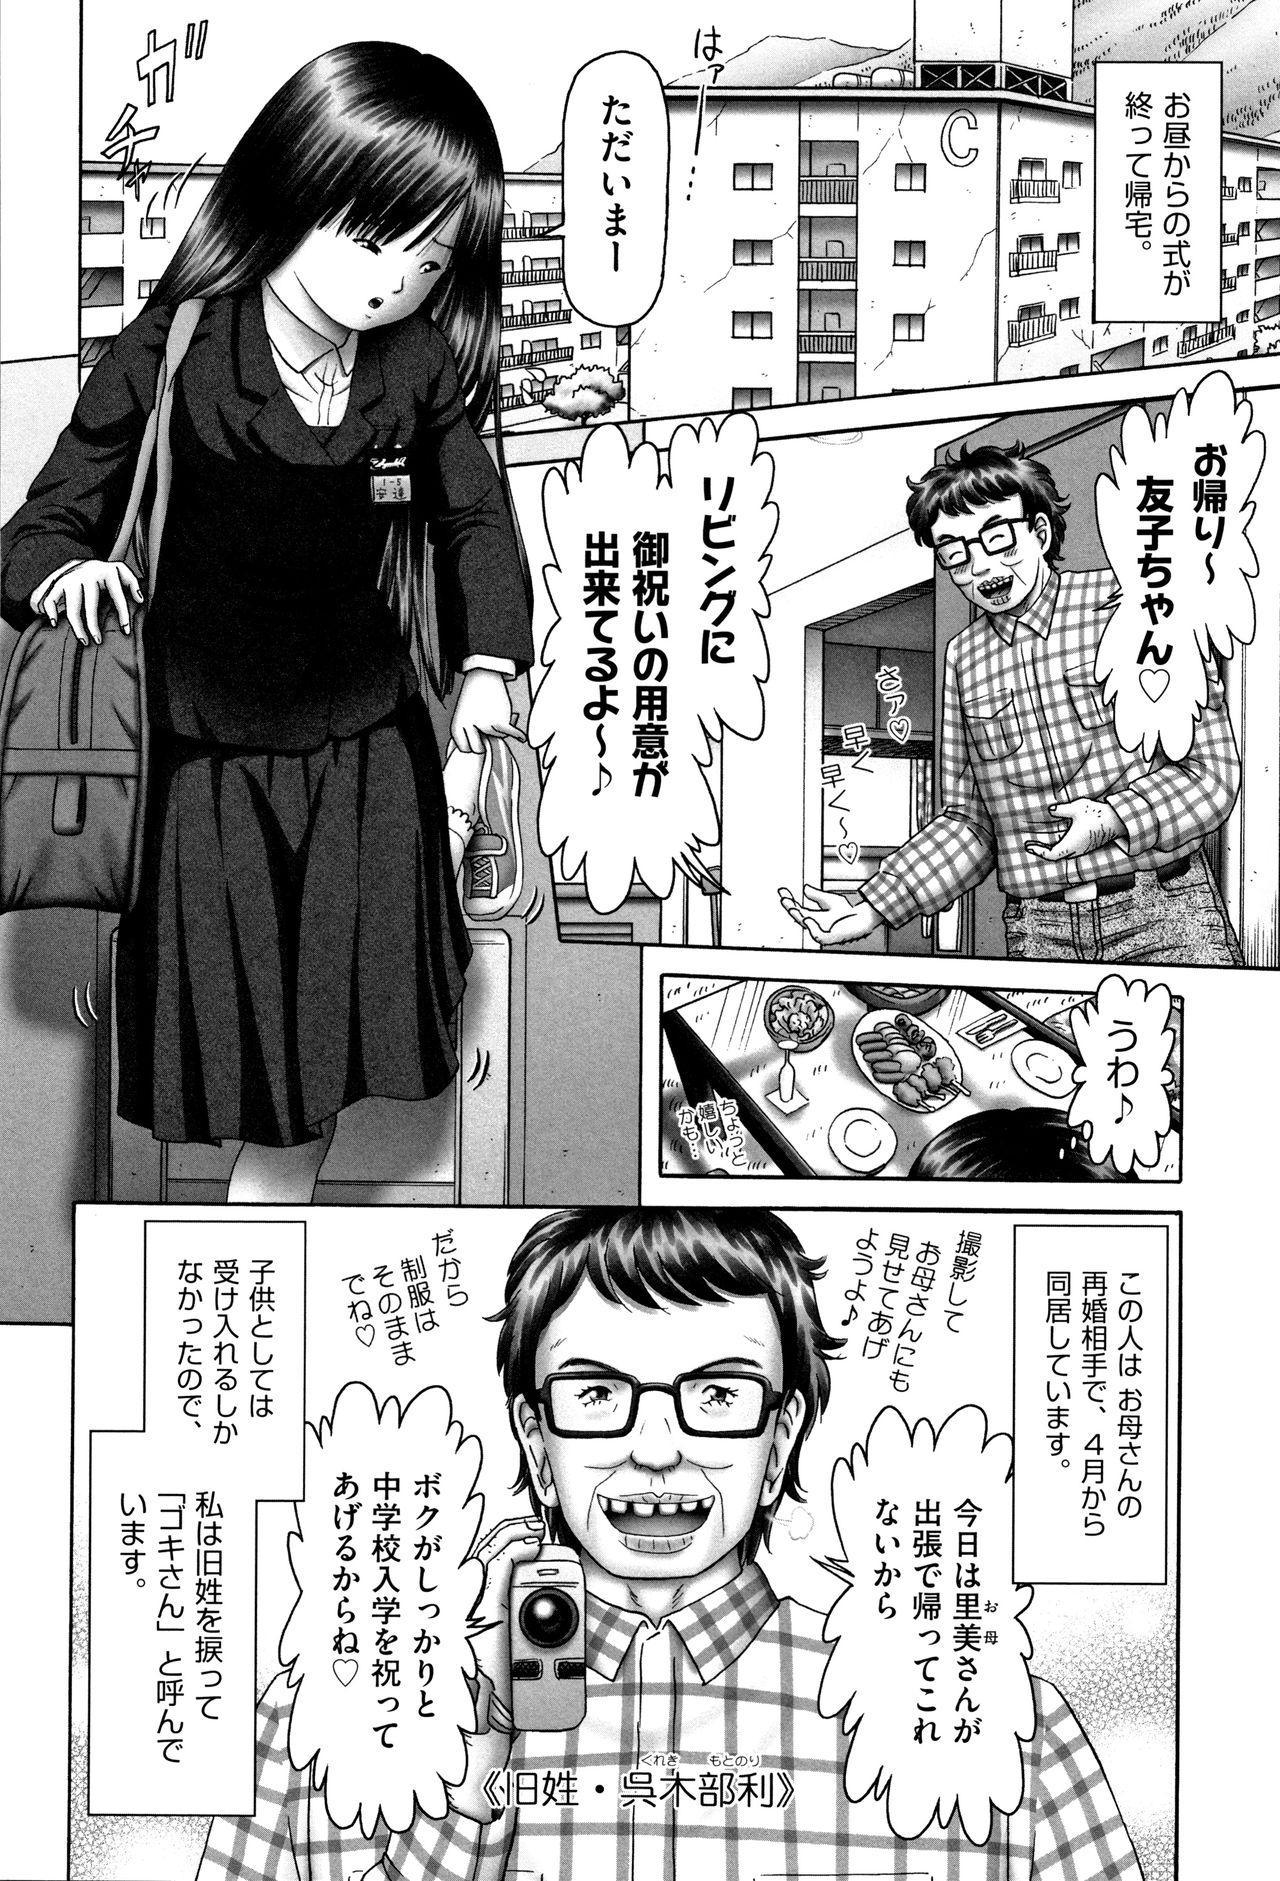 Shoujo Kumikyoku 11 32